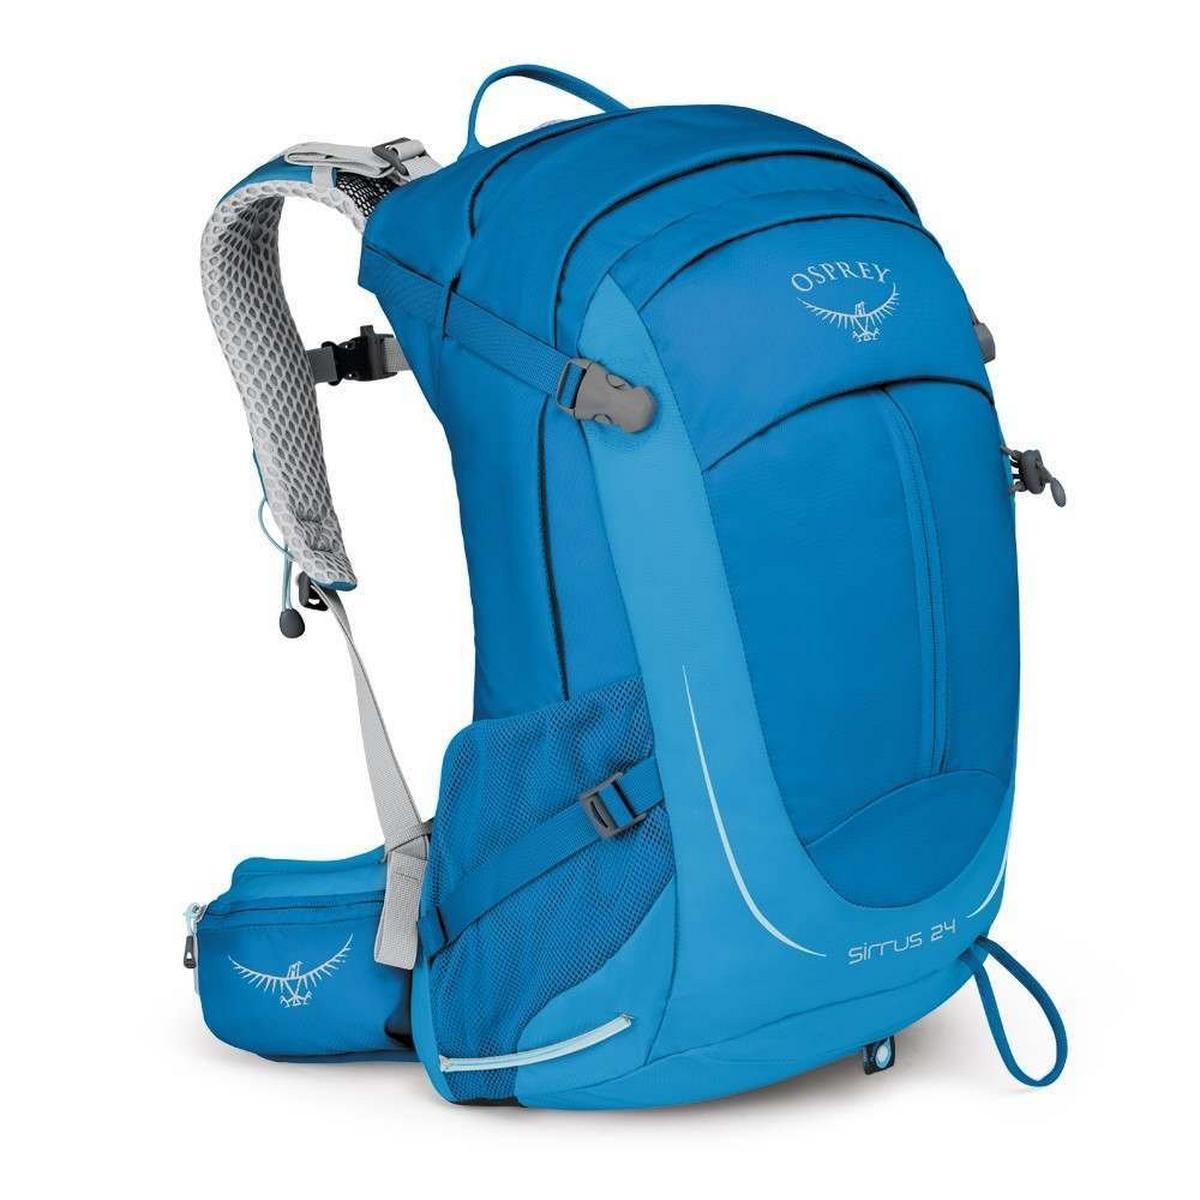 Osprey Women's Sirrus 24 Backpack